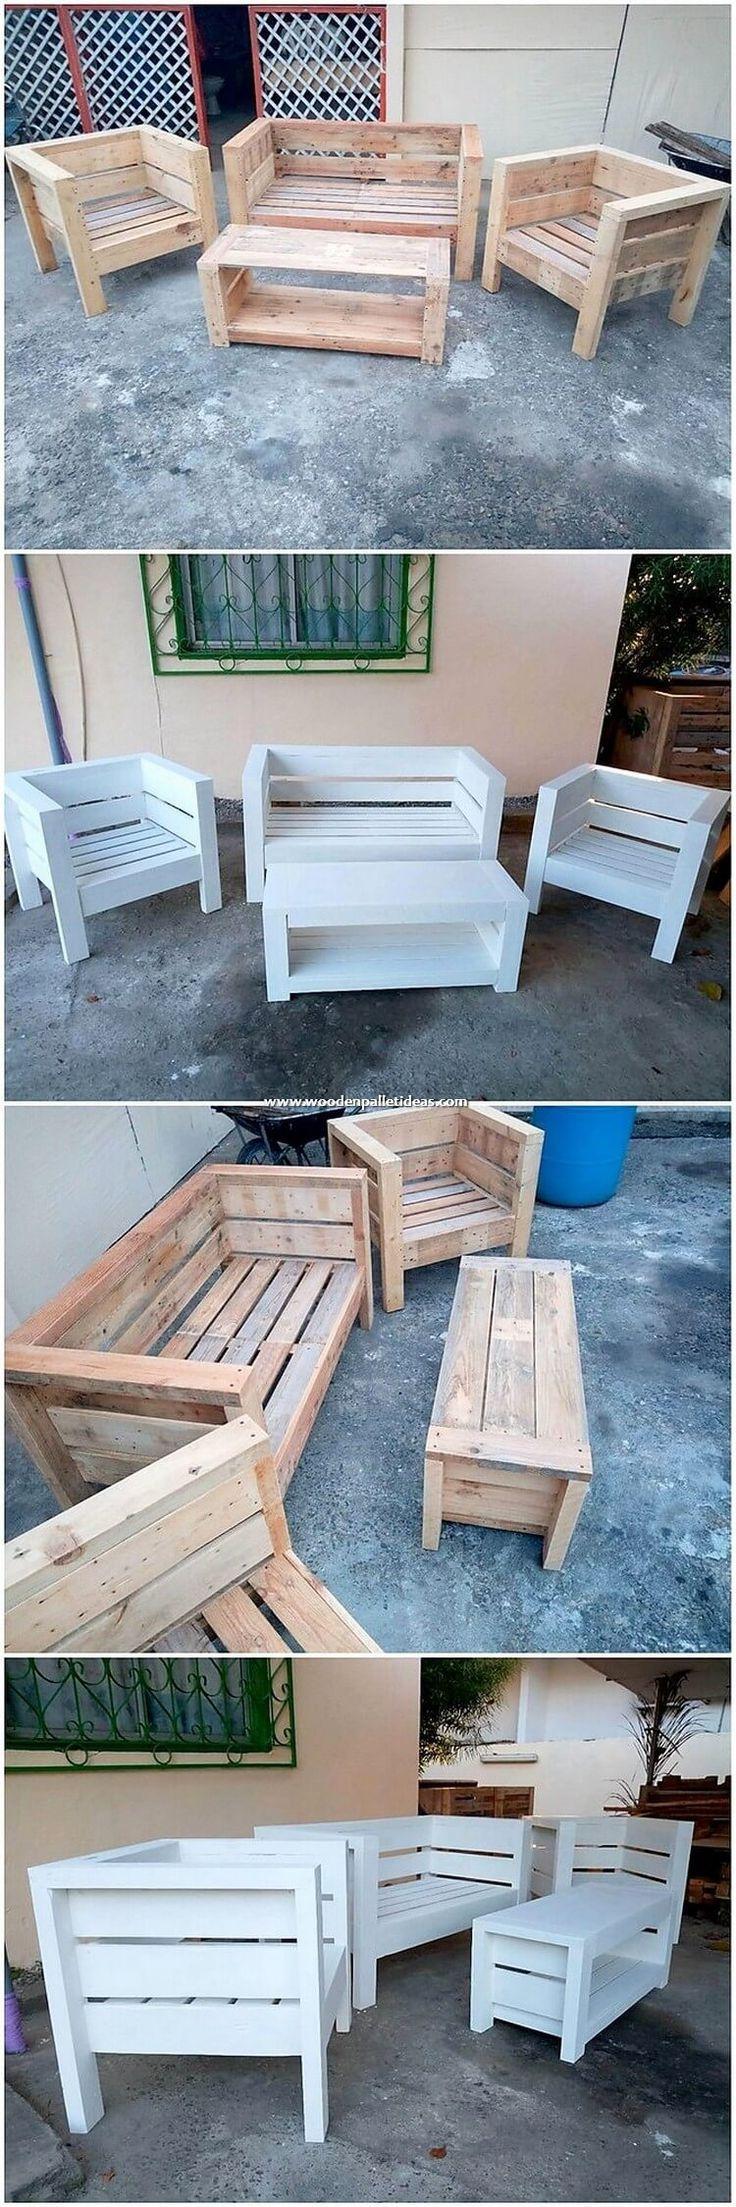 Fantastic Looking DIY Wooden Pallet Creations